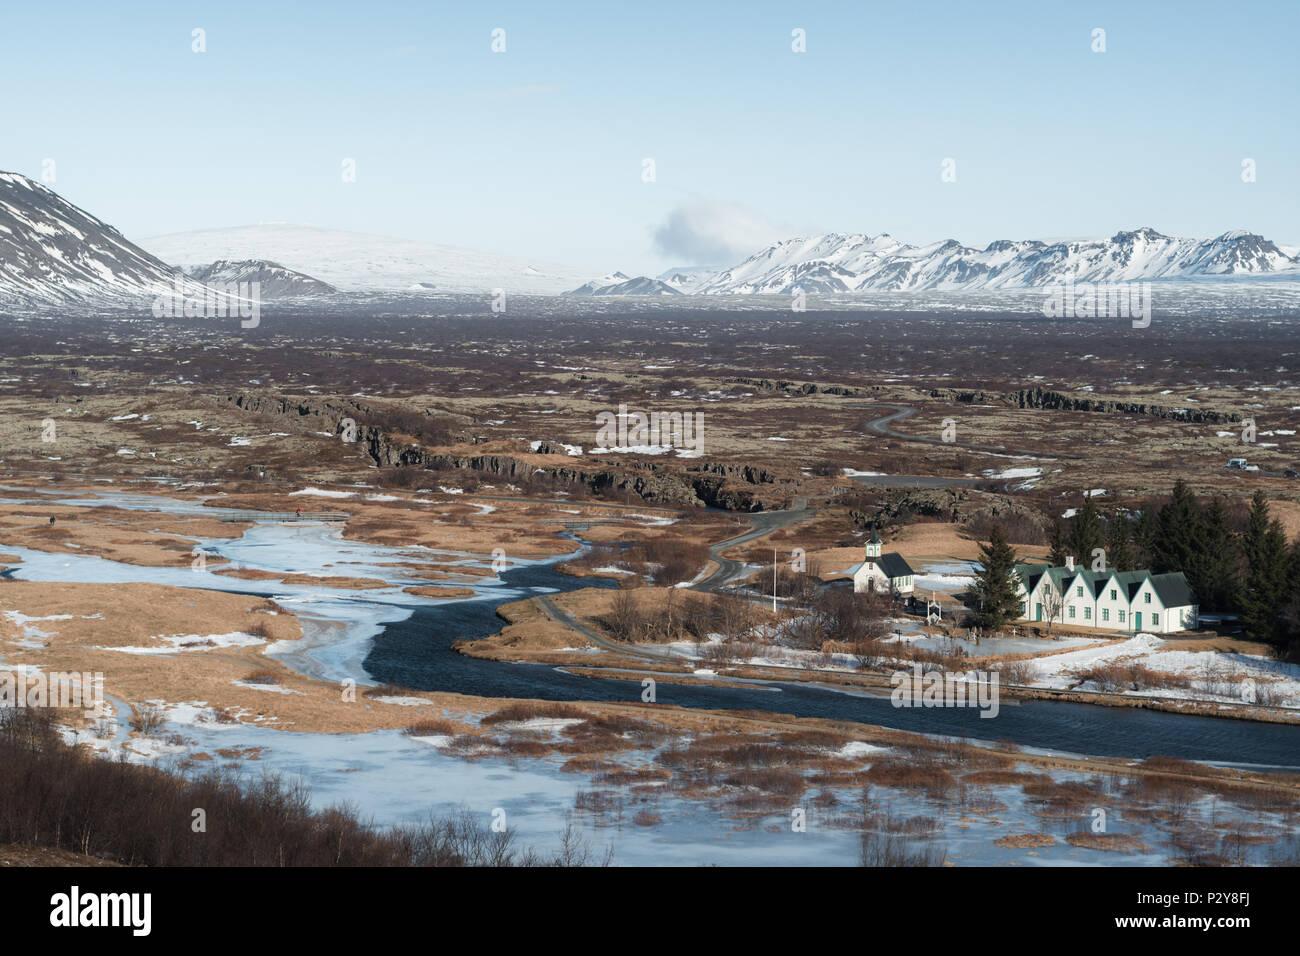 Wide shot of Þingvellir National Park on a clear sunny day. Öxará River, Þingvellir church and the site of Iceland's first parliament can be seen. Stock Photo